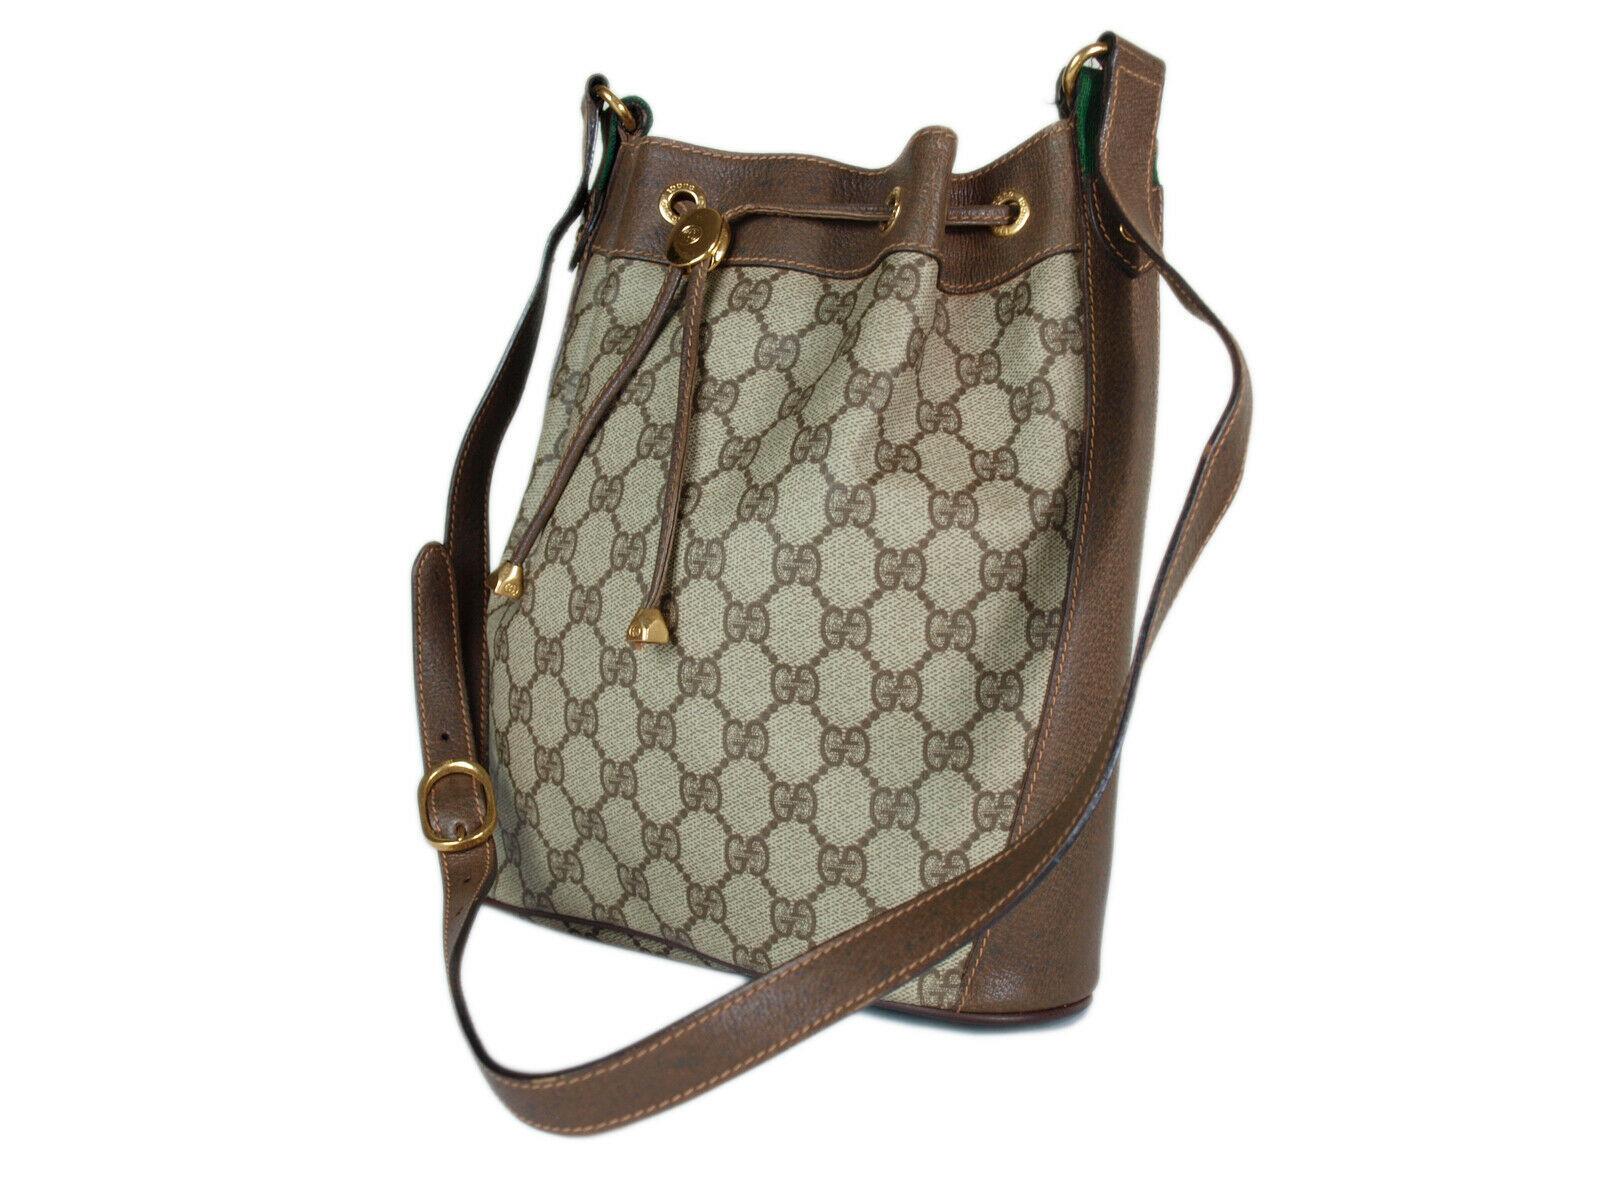 GUCCI GG Web PVC Canvas Leather Browns Drawstring Shoulder Bag GS2171